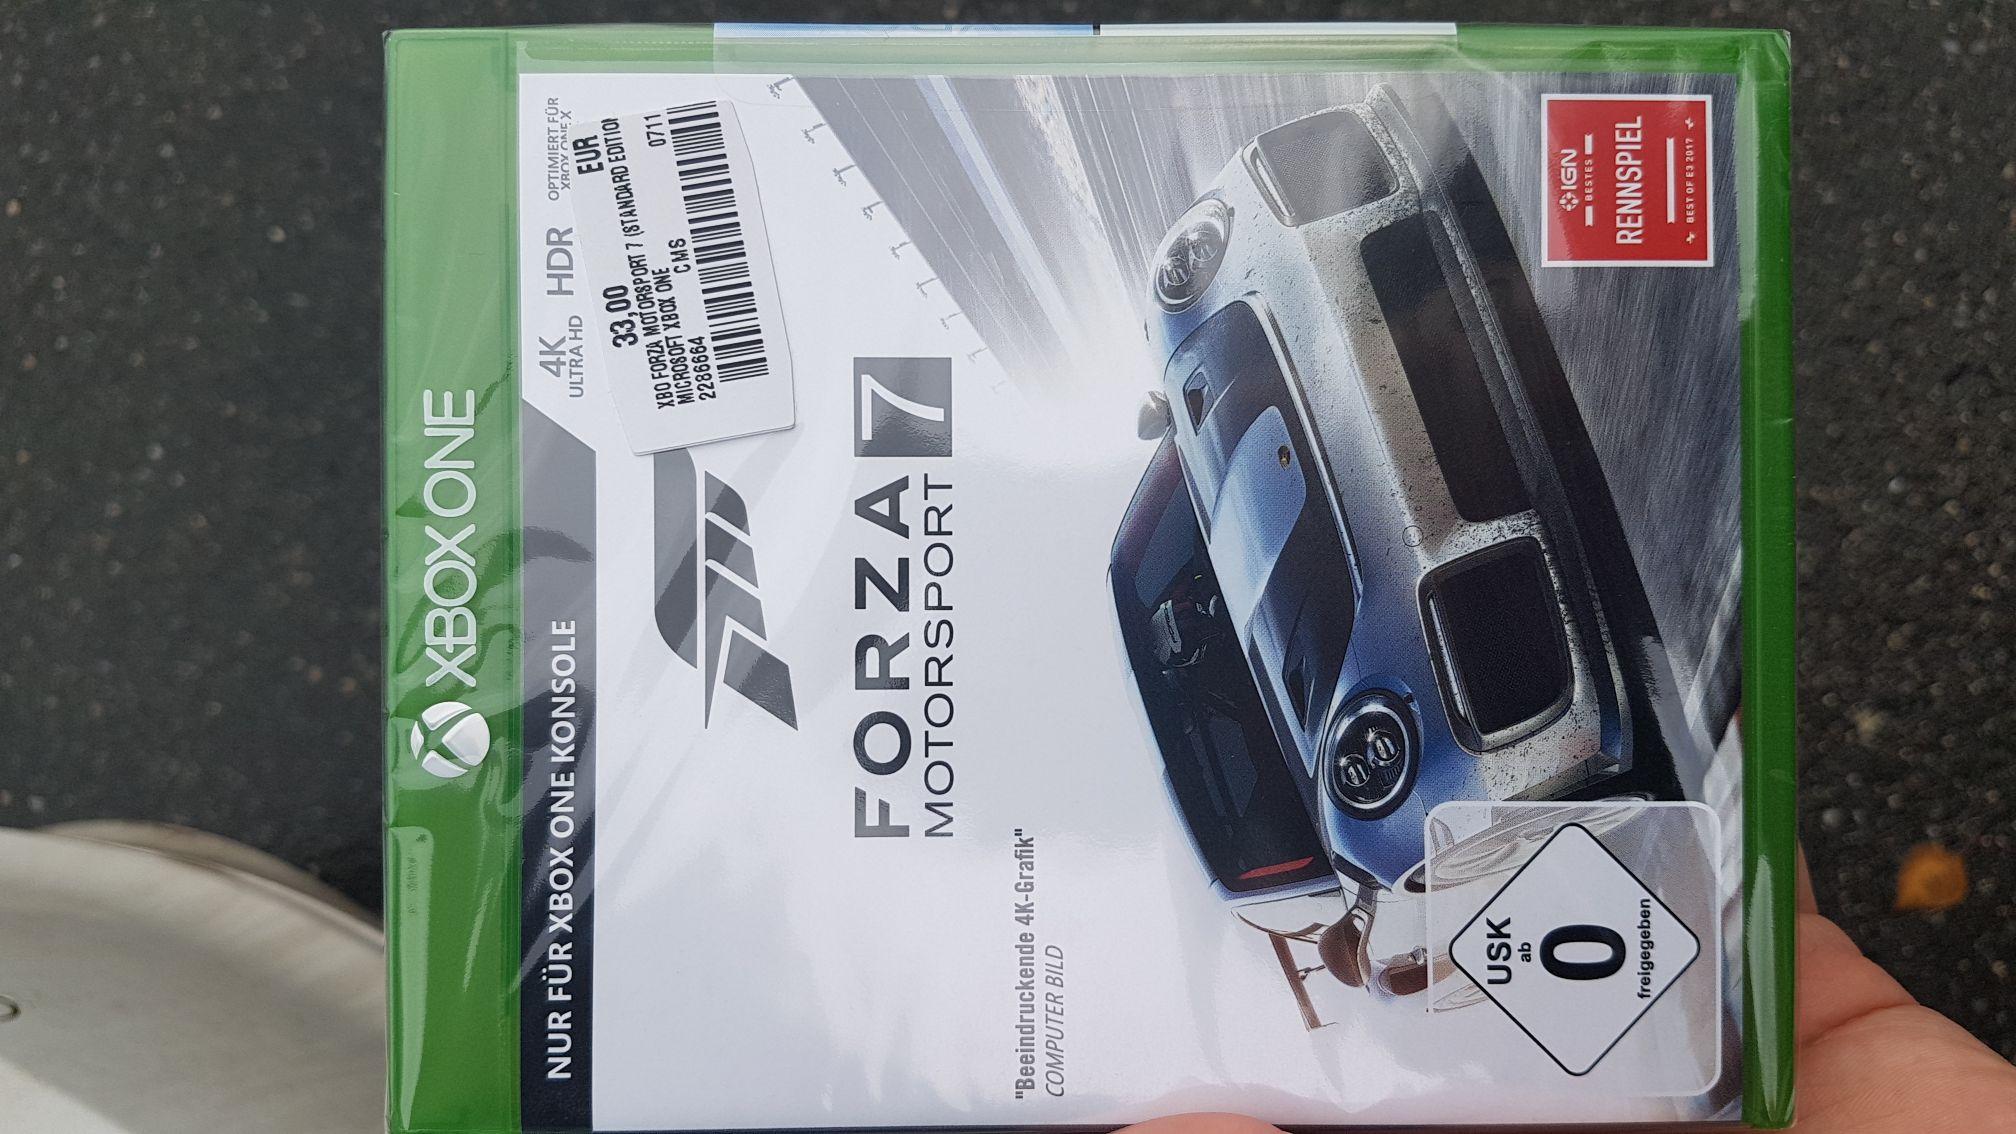 (Lokal - Nürnberg - Mediamarkt) Forza Motorsport 7 XBox